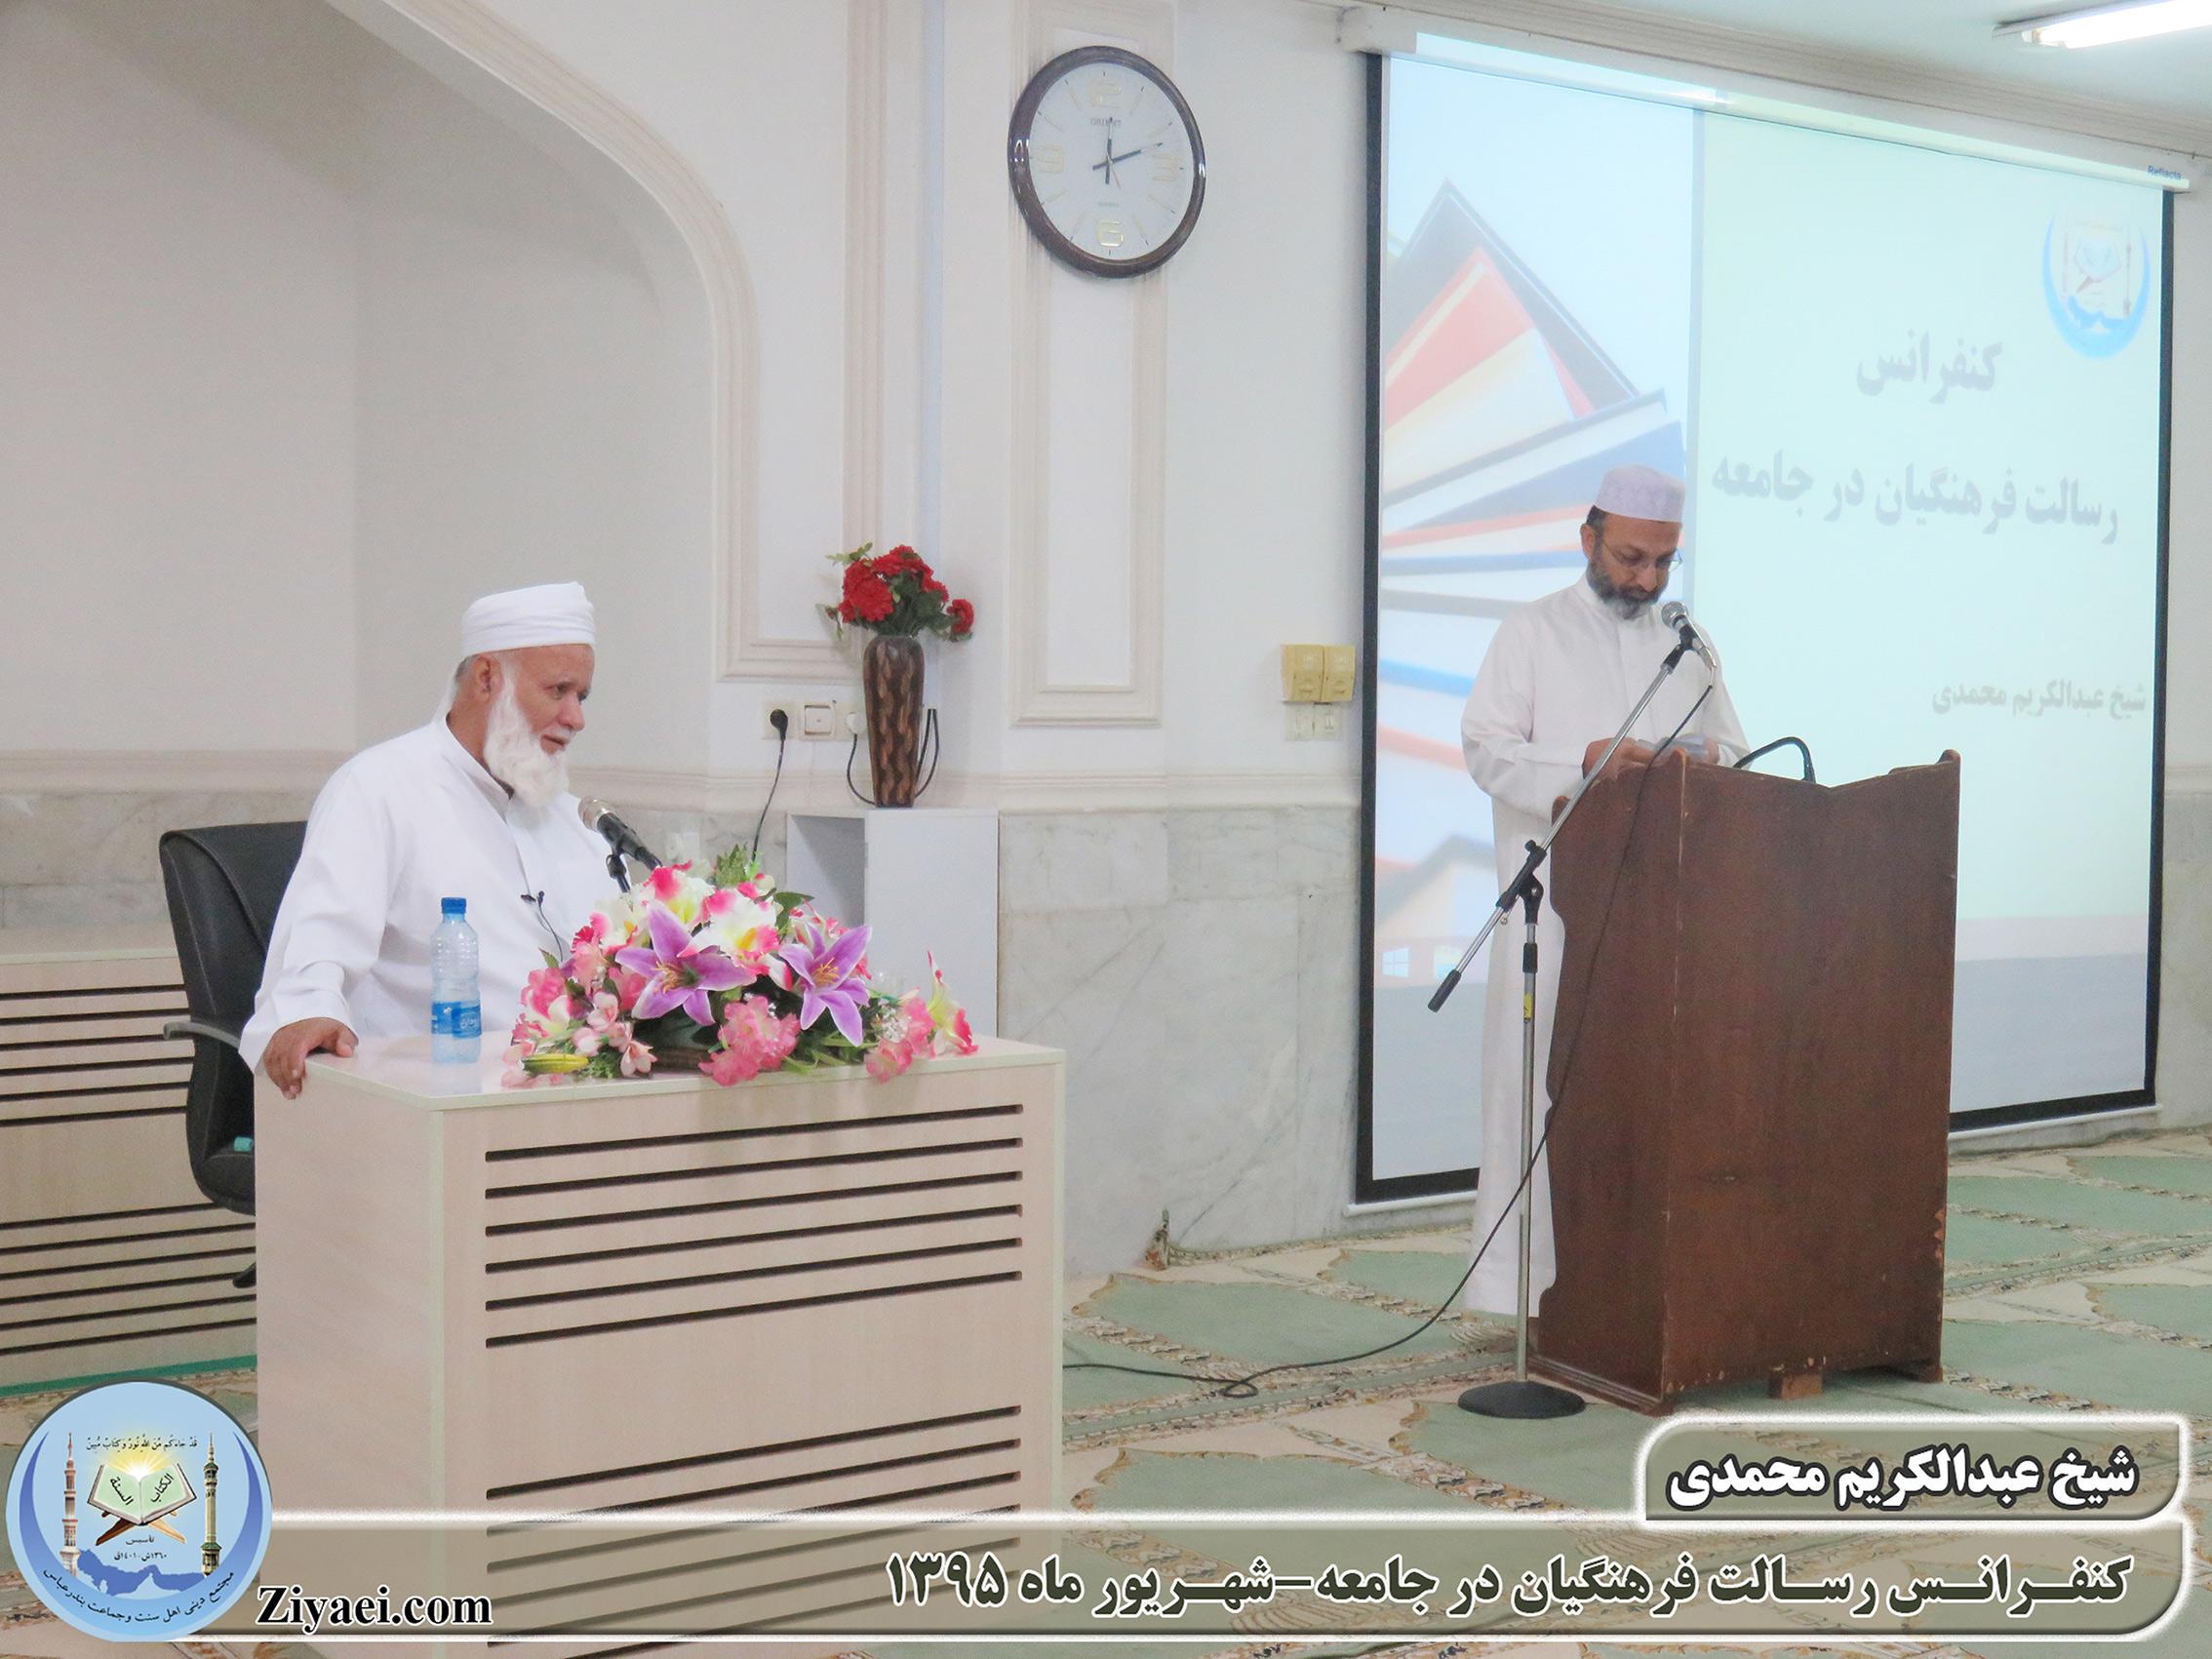 کنفرانس اهمیت رسالت فرهنگیان در جامعه - شیخ عبدالکریم محمدی